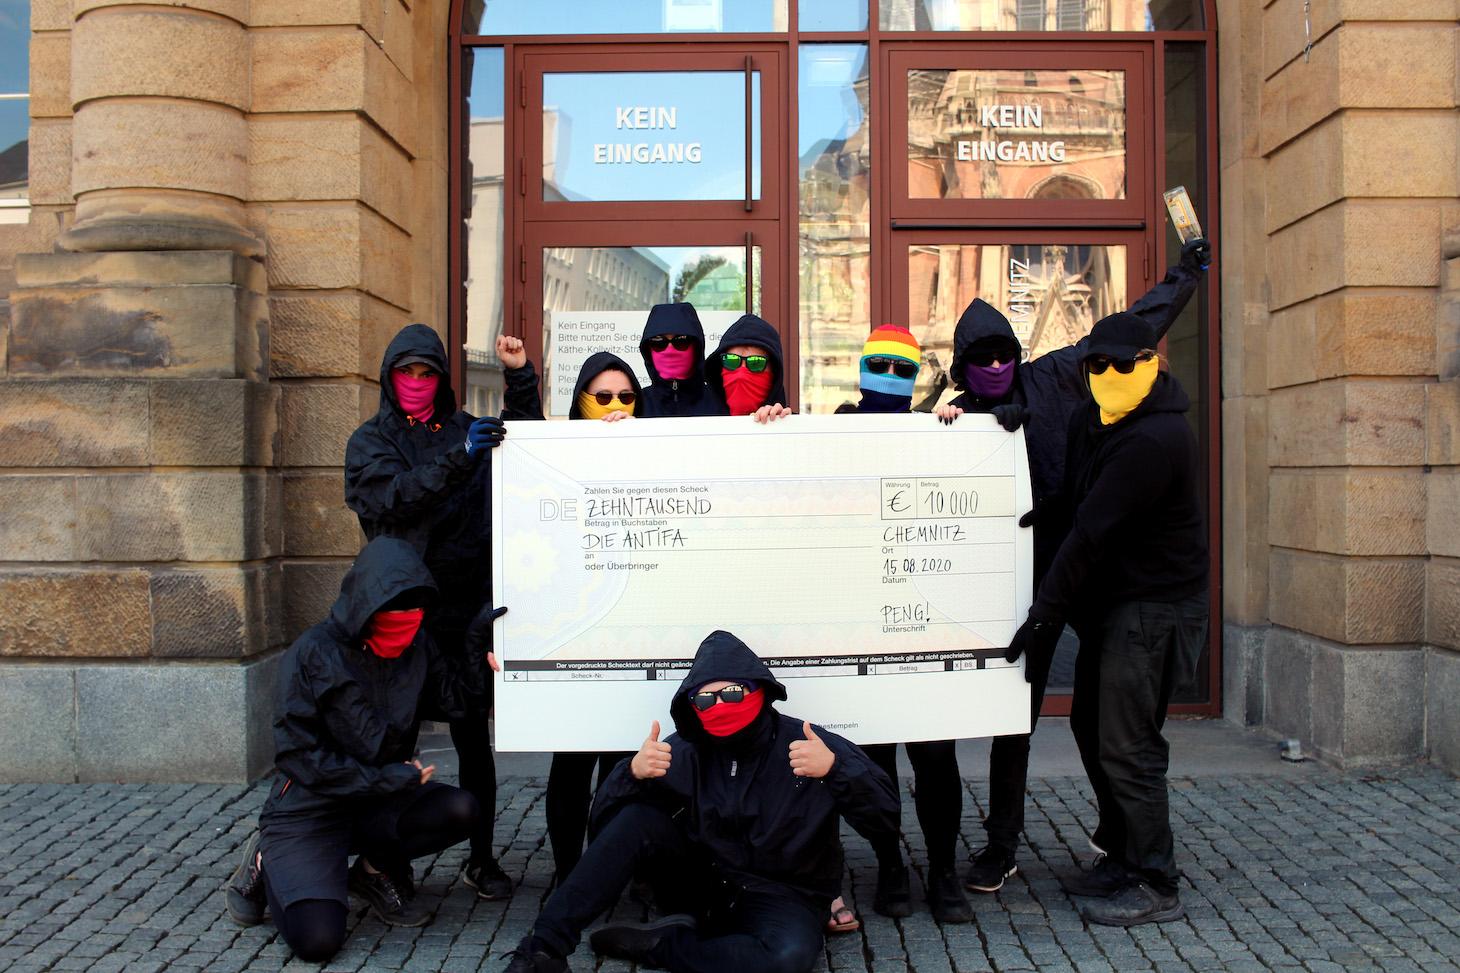 A Scuffle Over Anti-Fascist Art in a German Museum, Explained